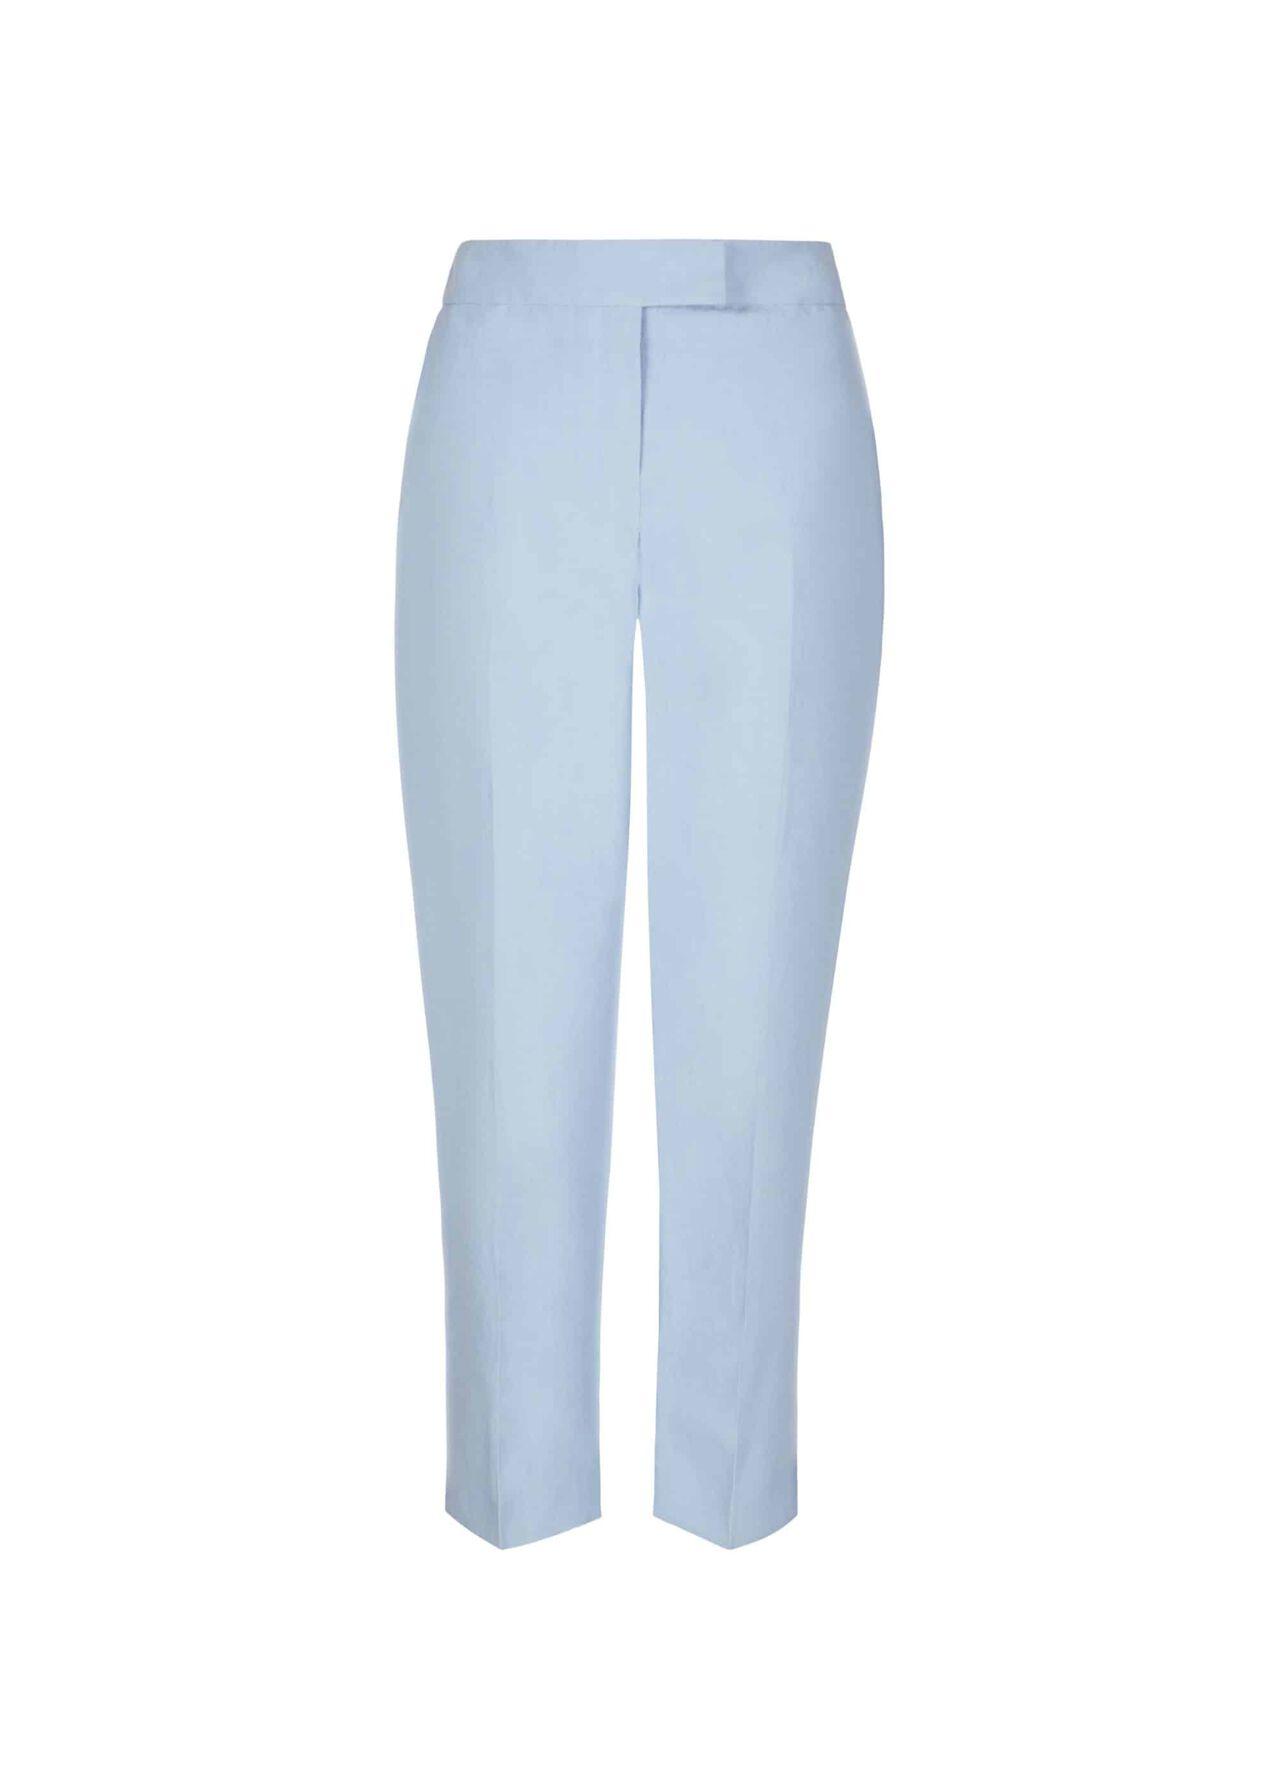 Jade Silk Blend Trousers Mist Blue